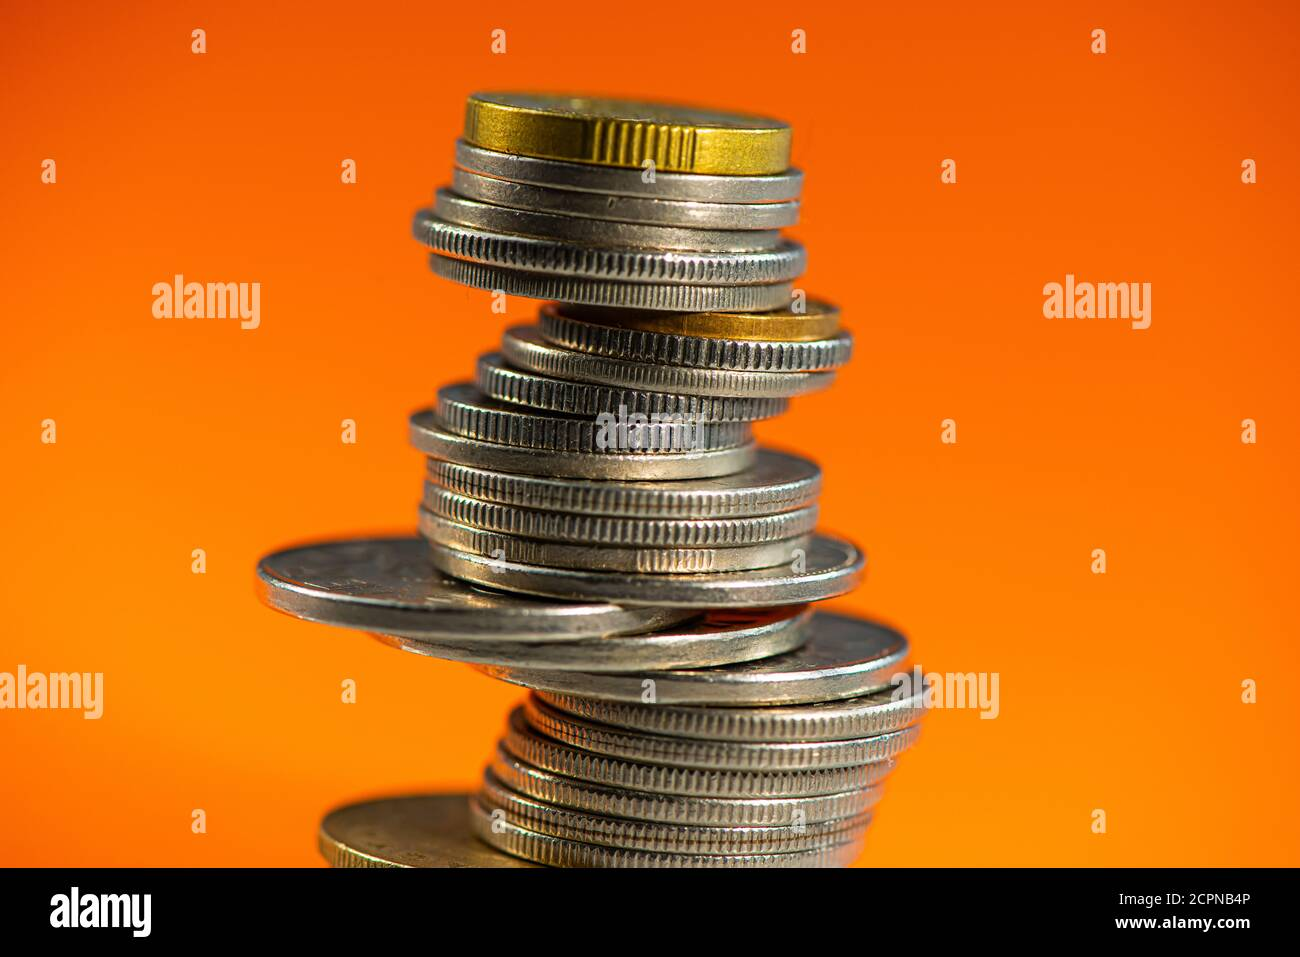 Pila de monedas suizas sobre fondo naranja. Concepto de negocio. Foto de stock